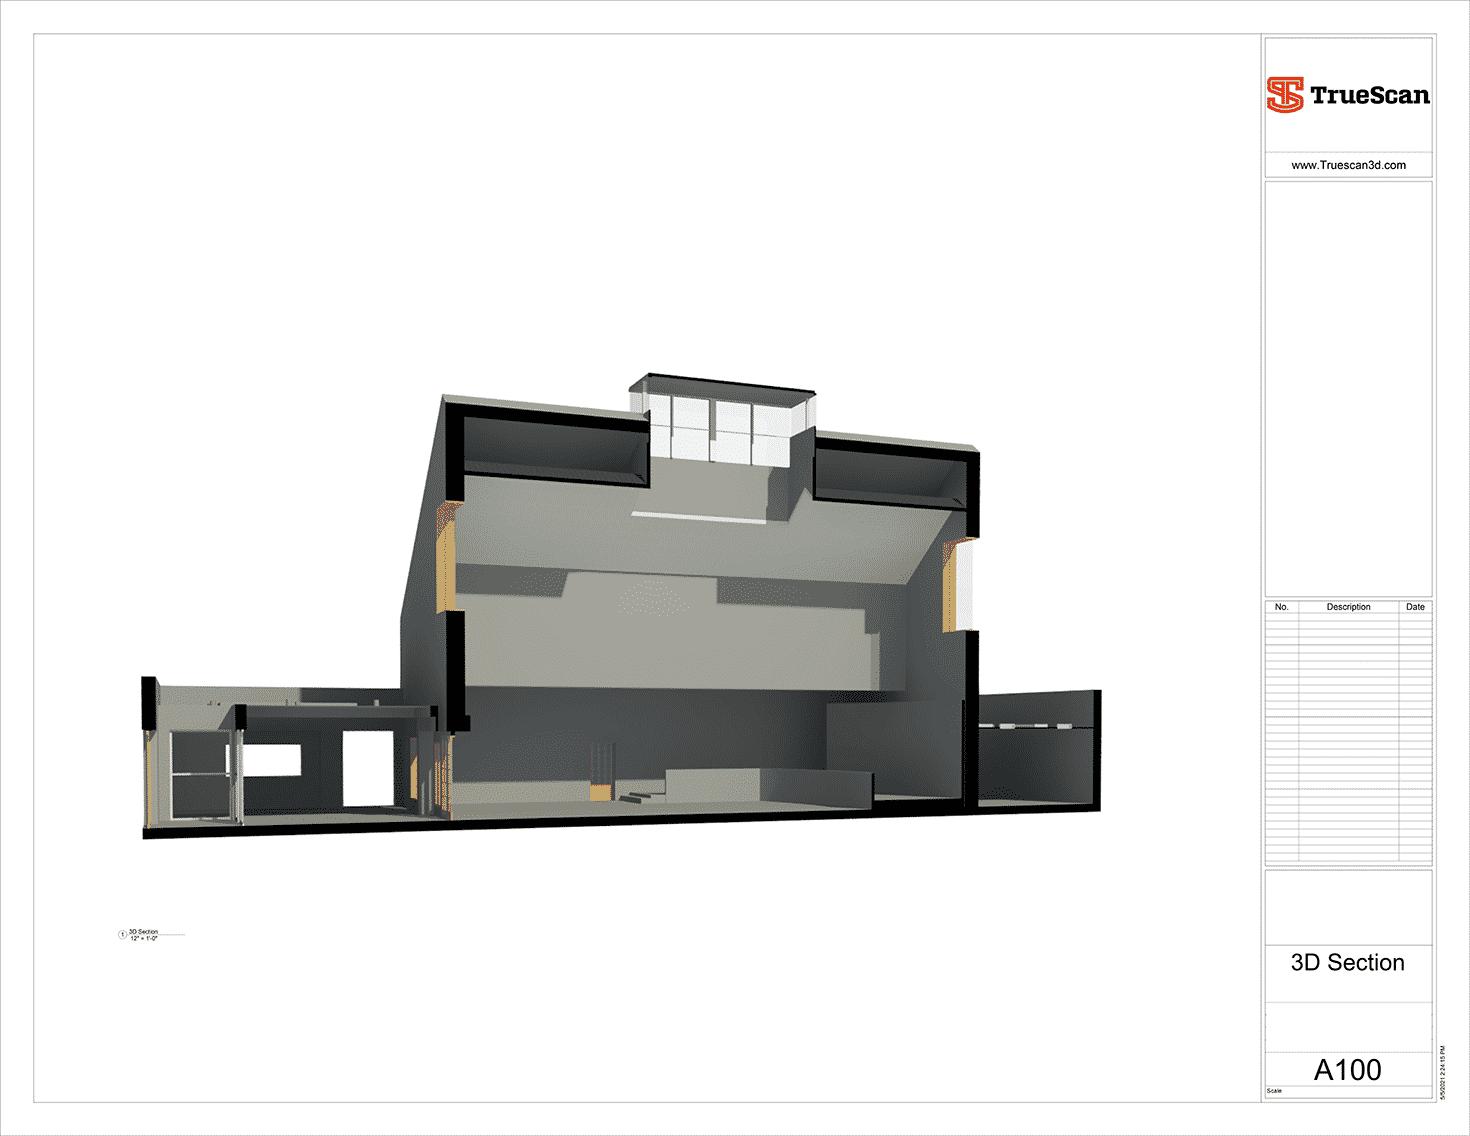 as-built plan, 3D model